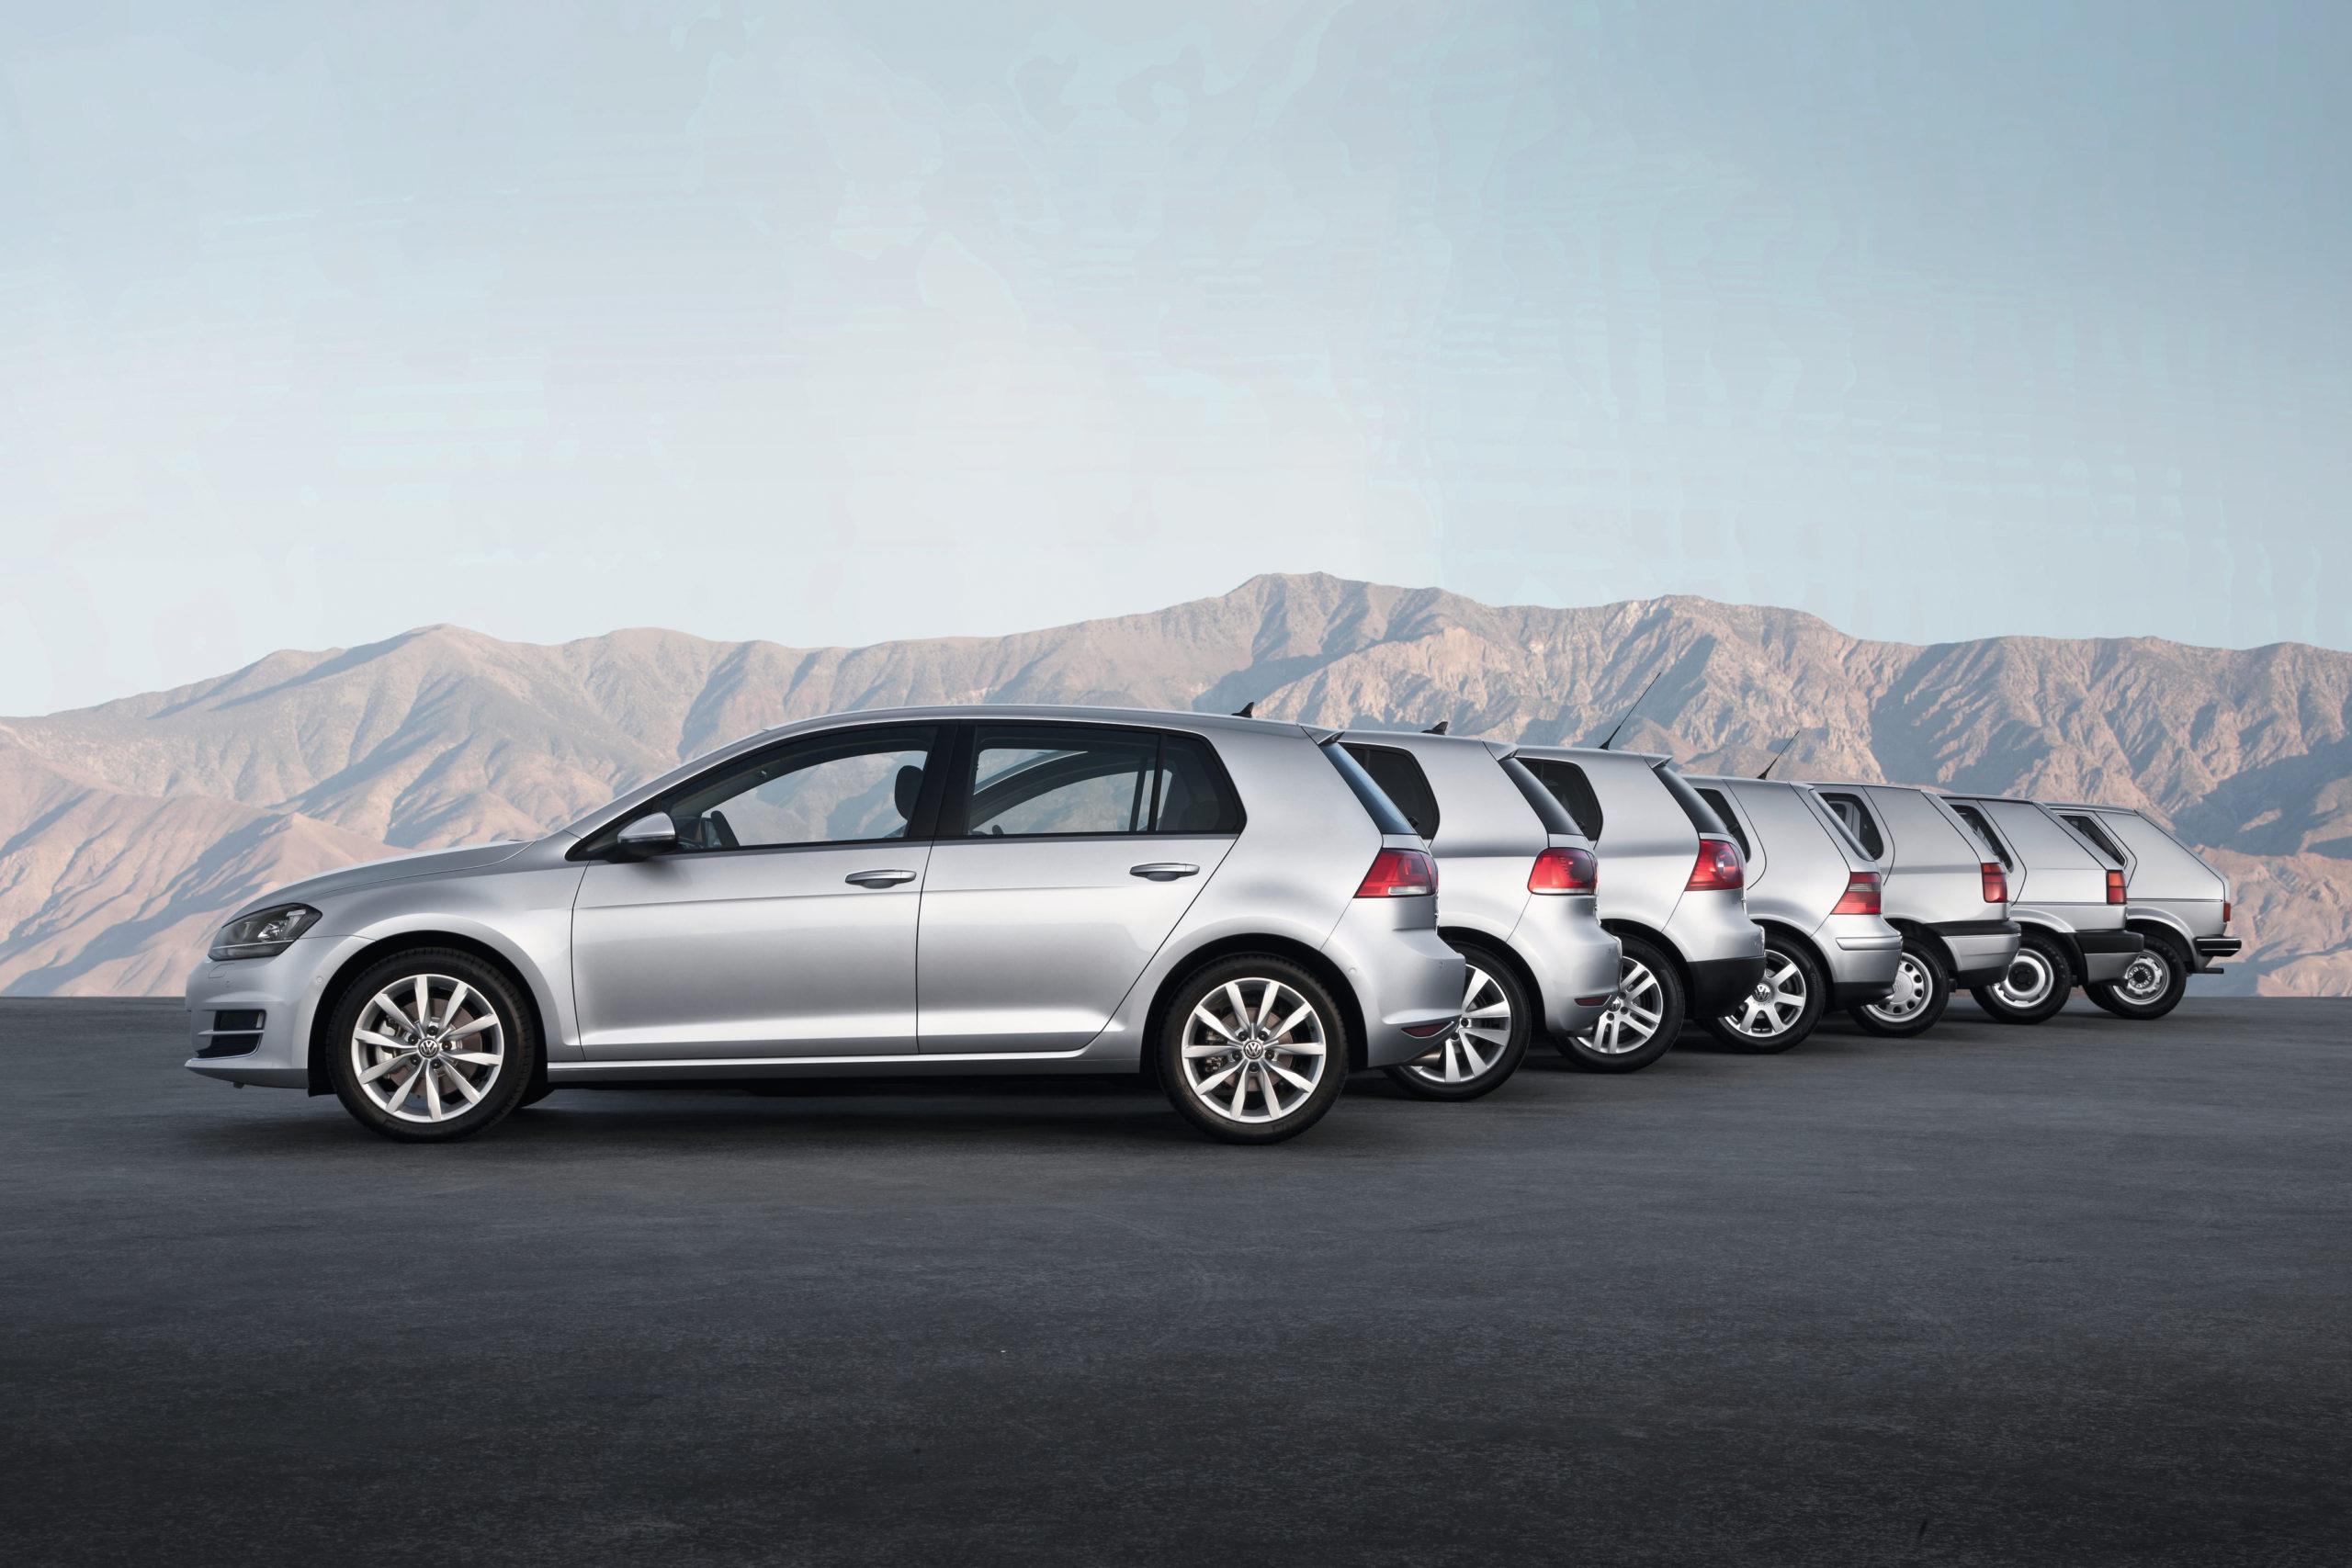 All VW Golf generations